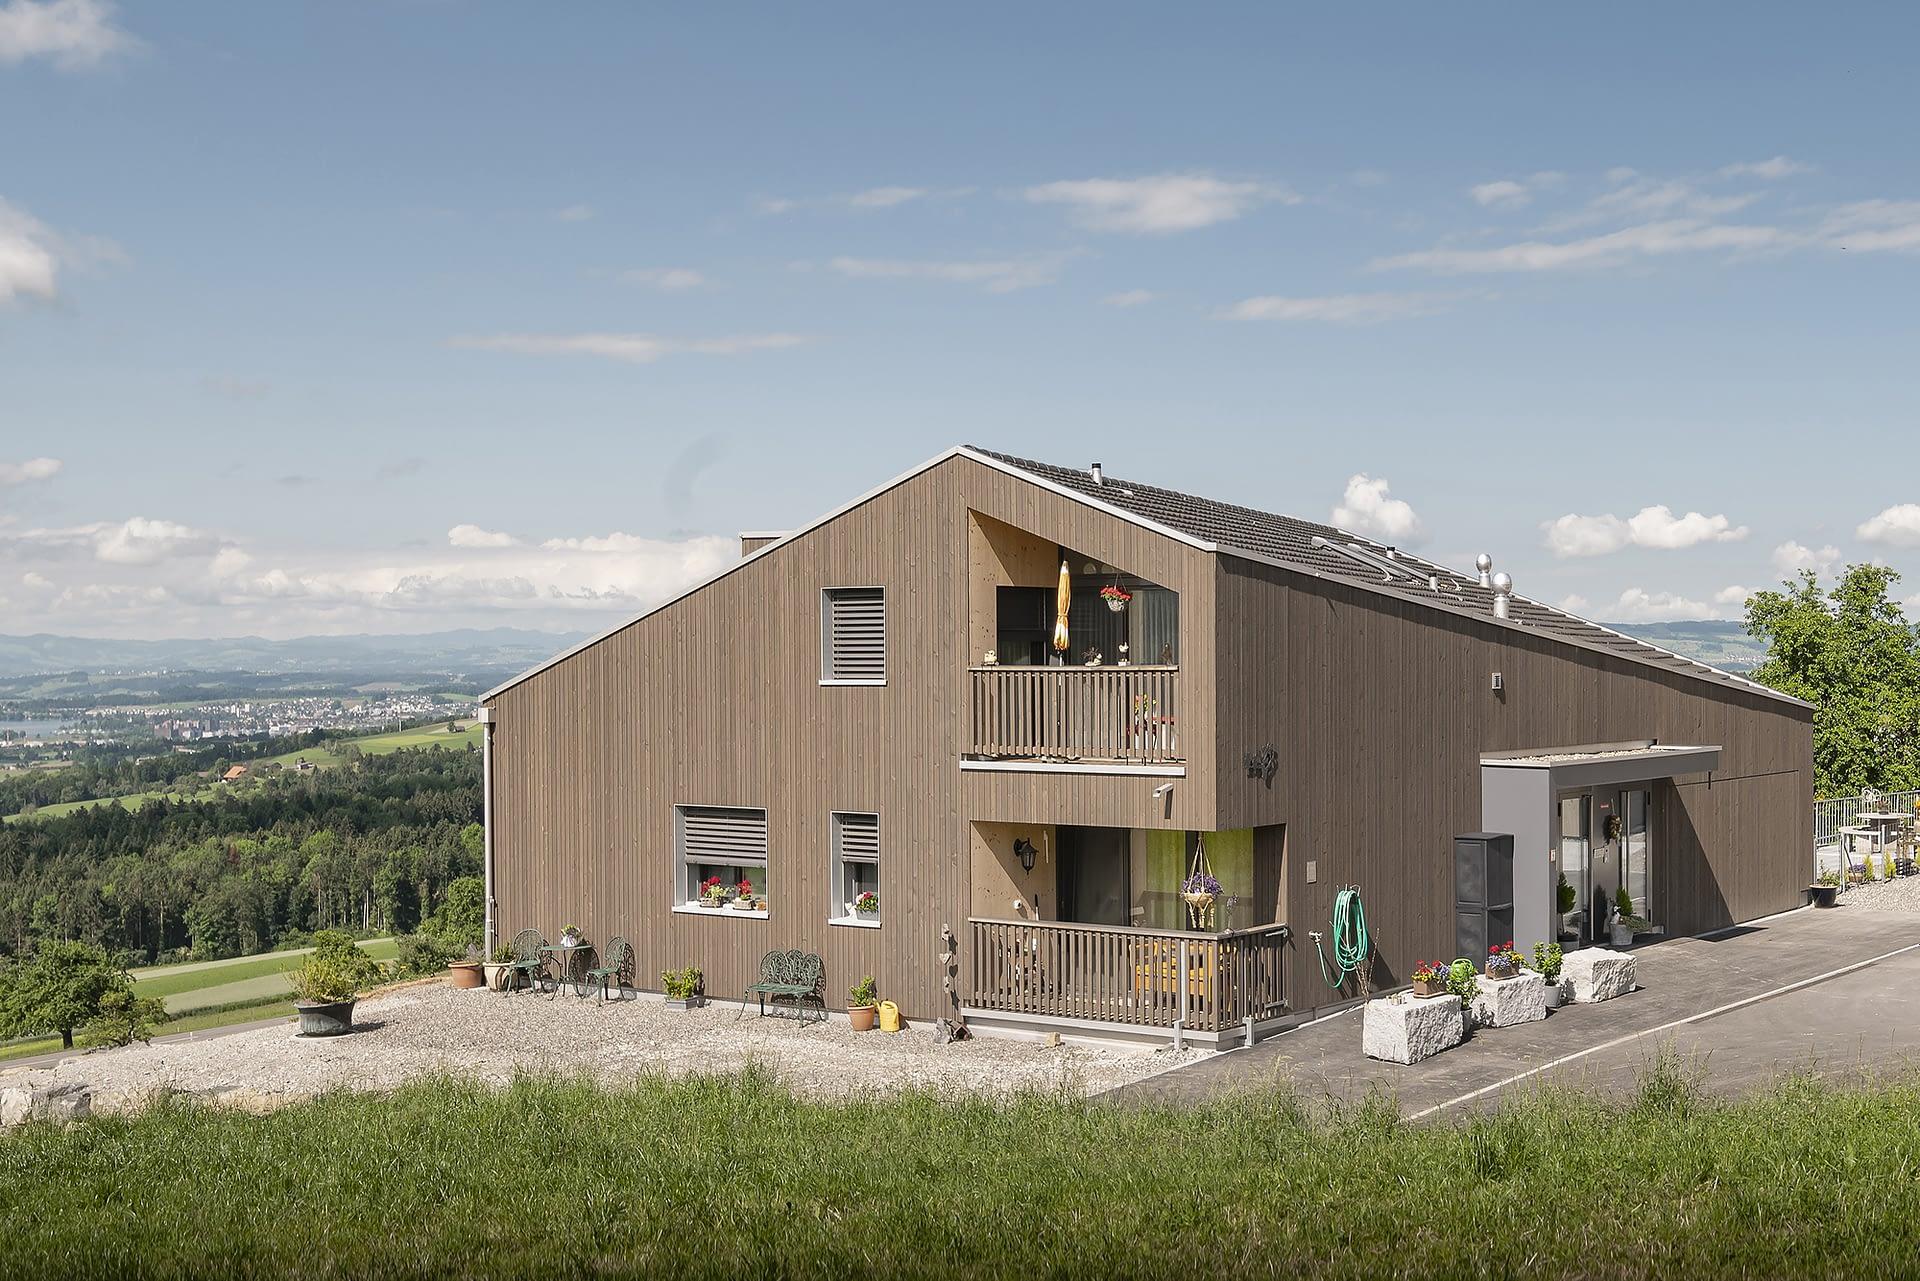 8925 Ebertswil hwp Architekten Neubau Zweifamilienhaus